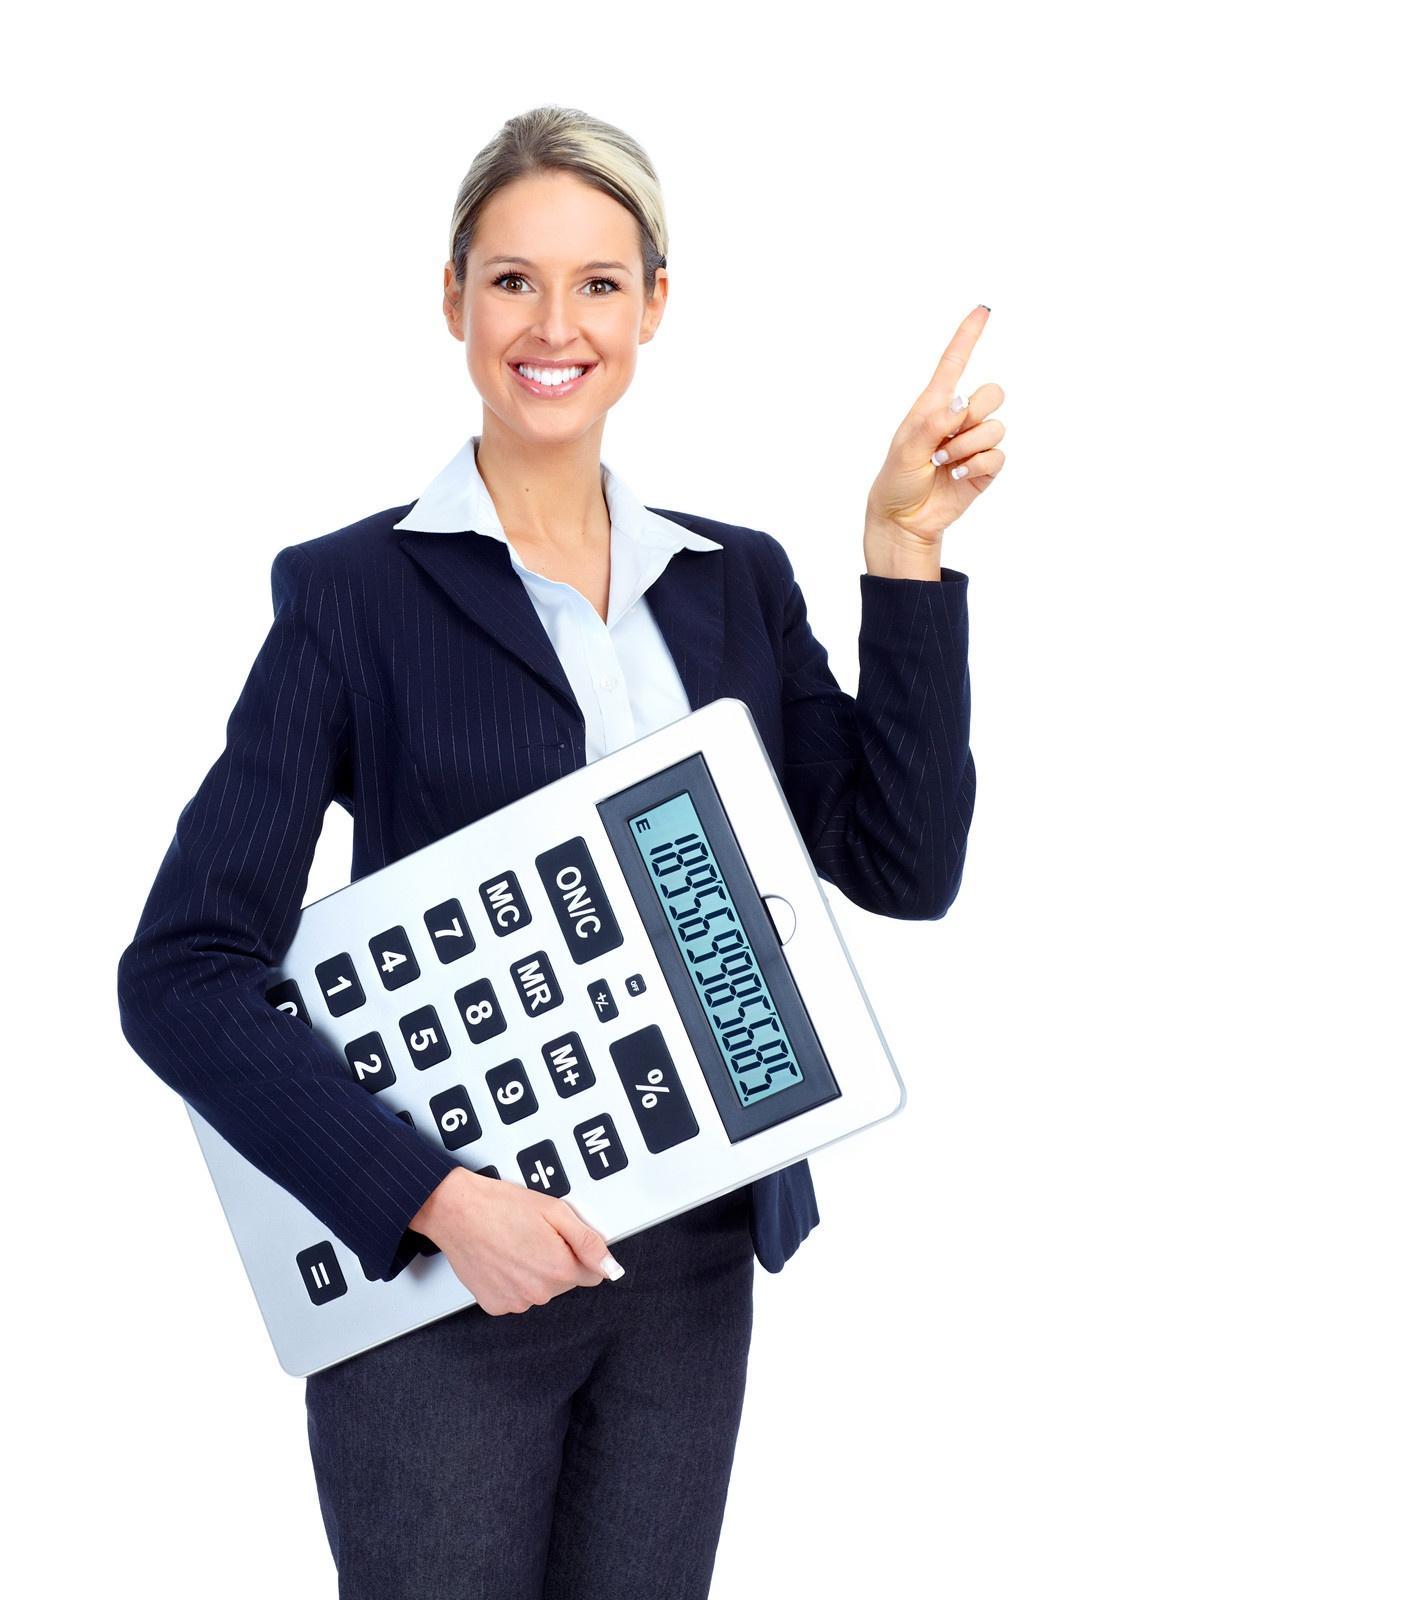 Woman with calculator.jpg